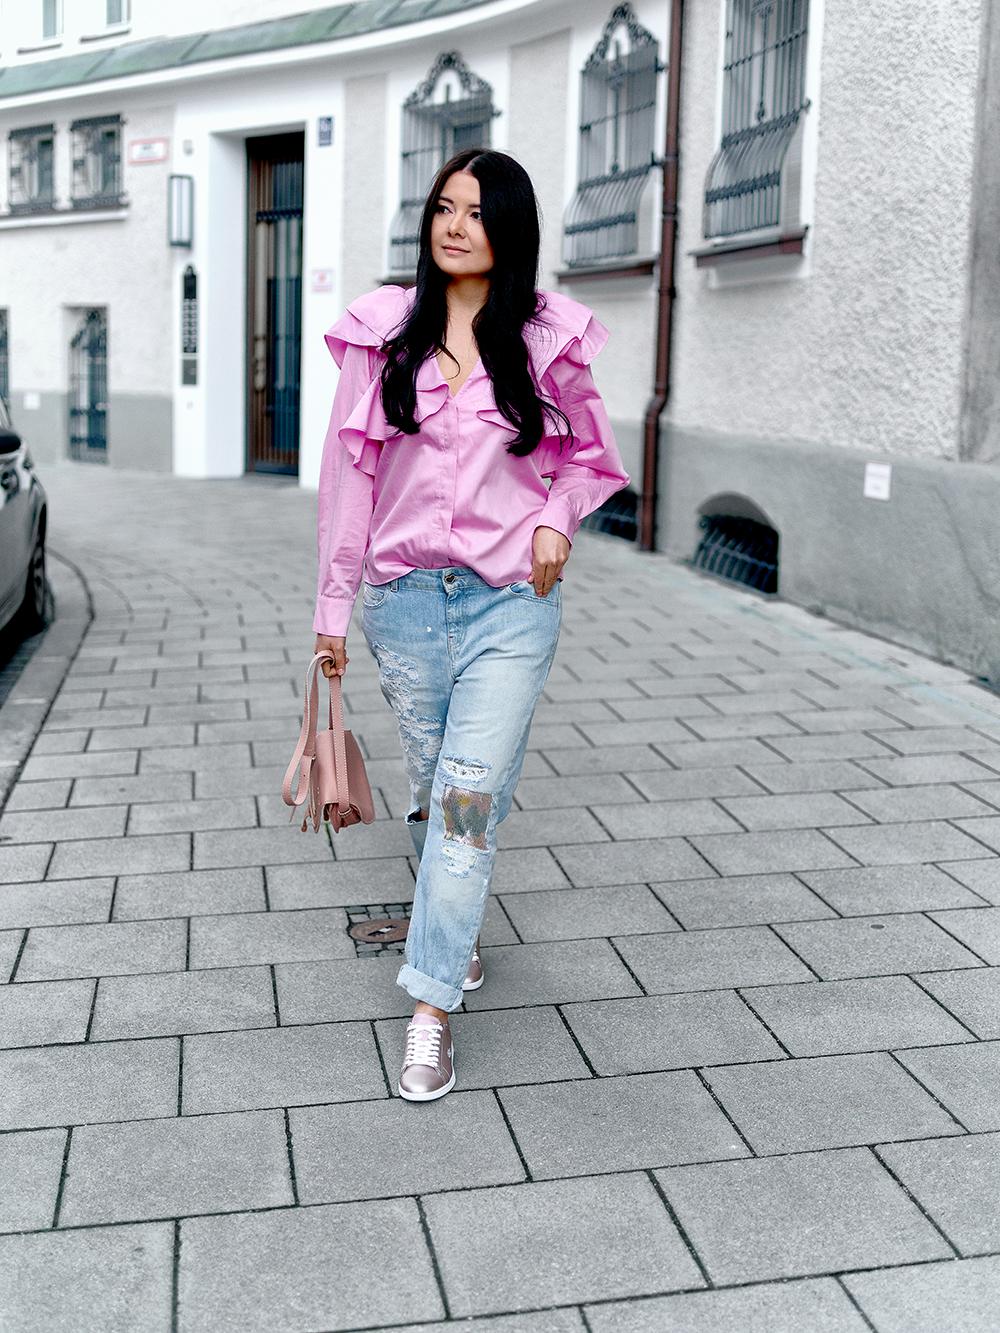 fashionambit-fashionblog-muenchen-modeblog-deutschland-blogger-modeblogger-fashionblogger-bloggerdeutschland-lifestyleblog-munich-style-blog-frischer-aussehen